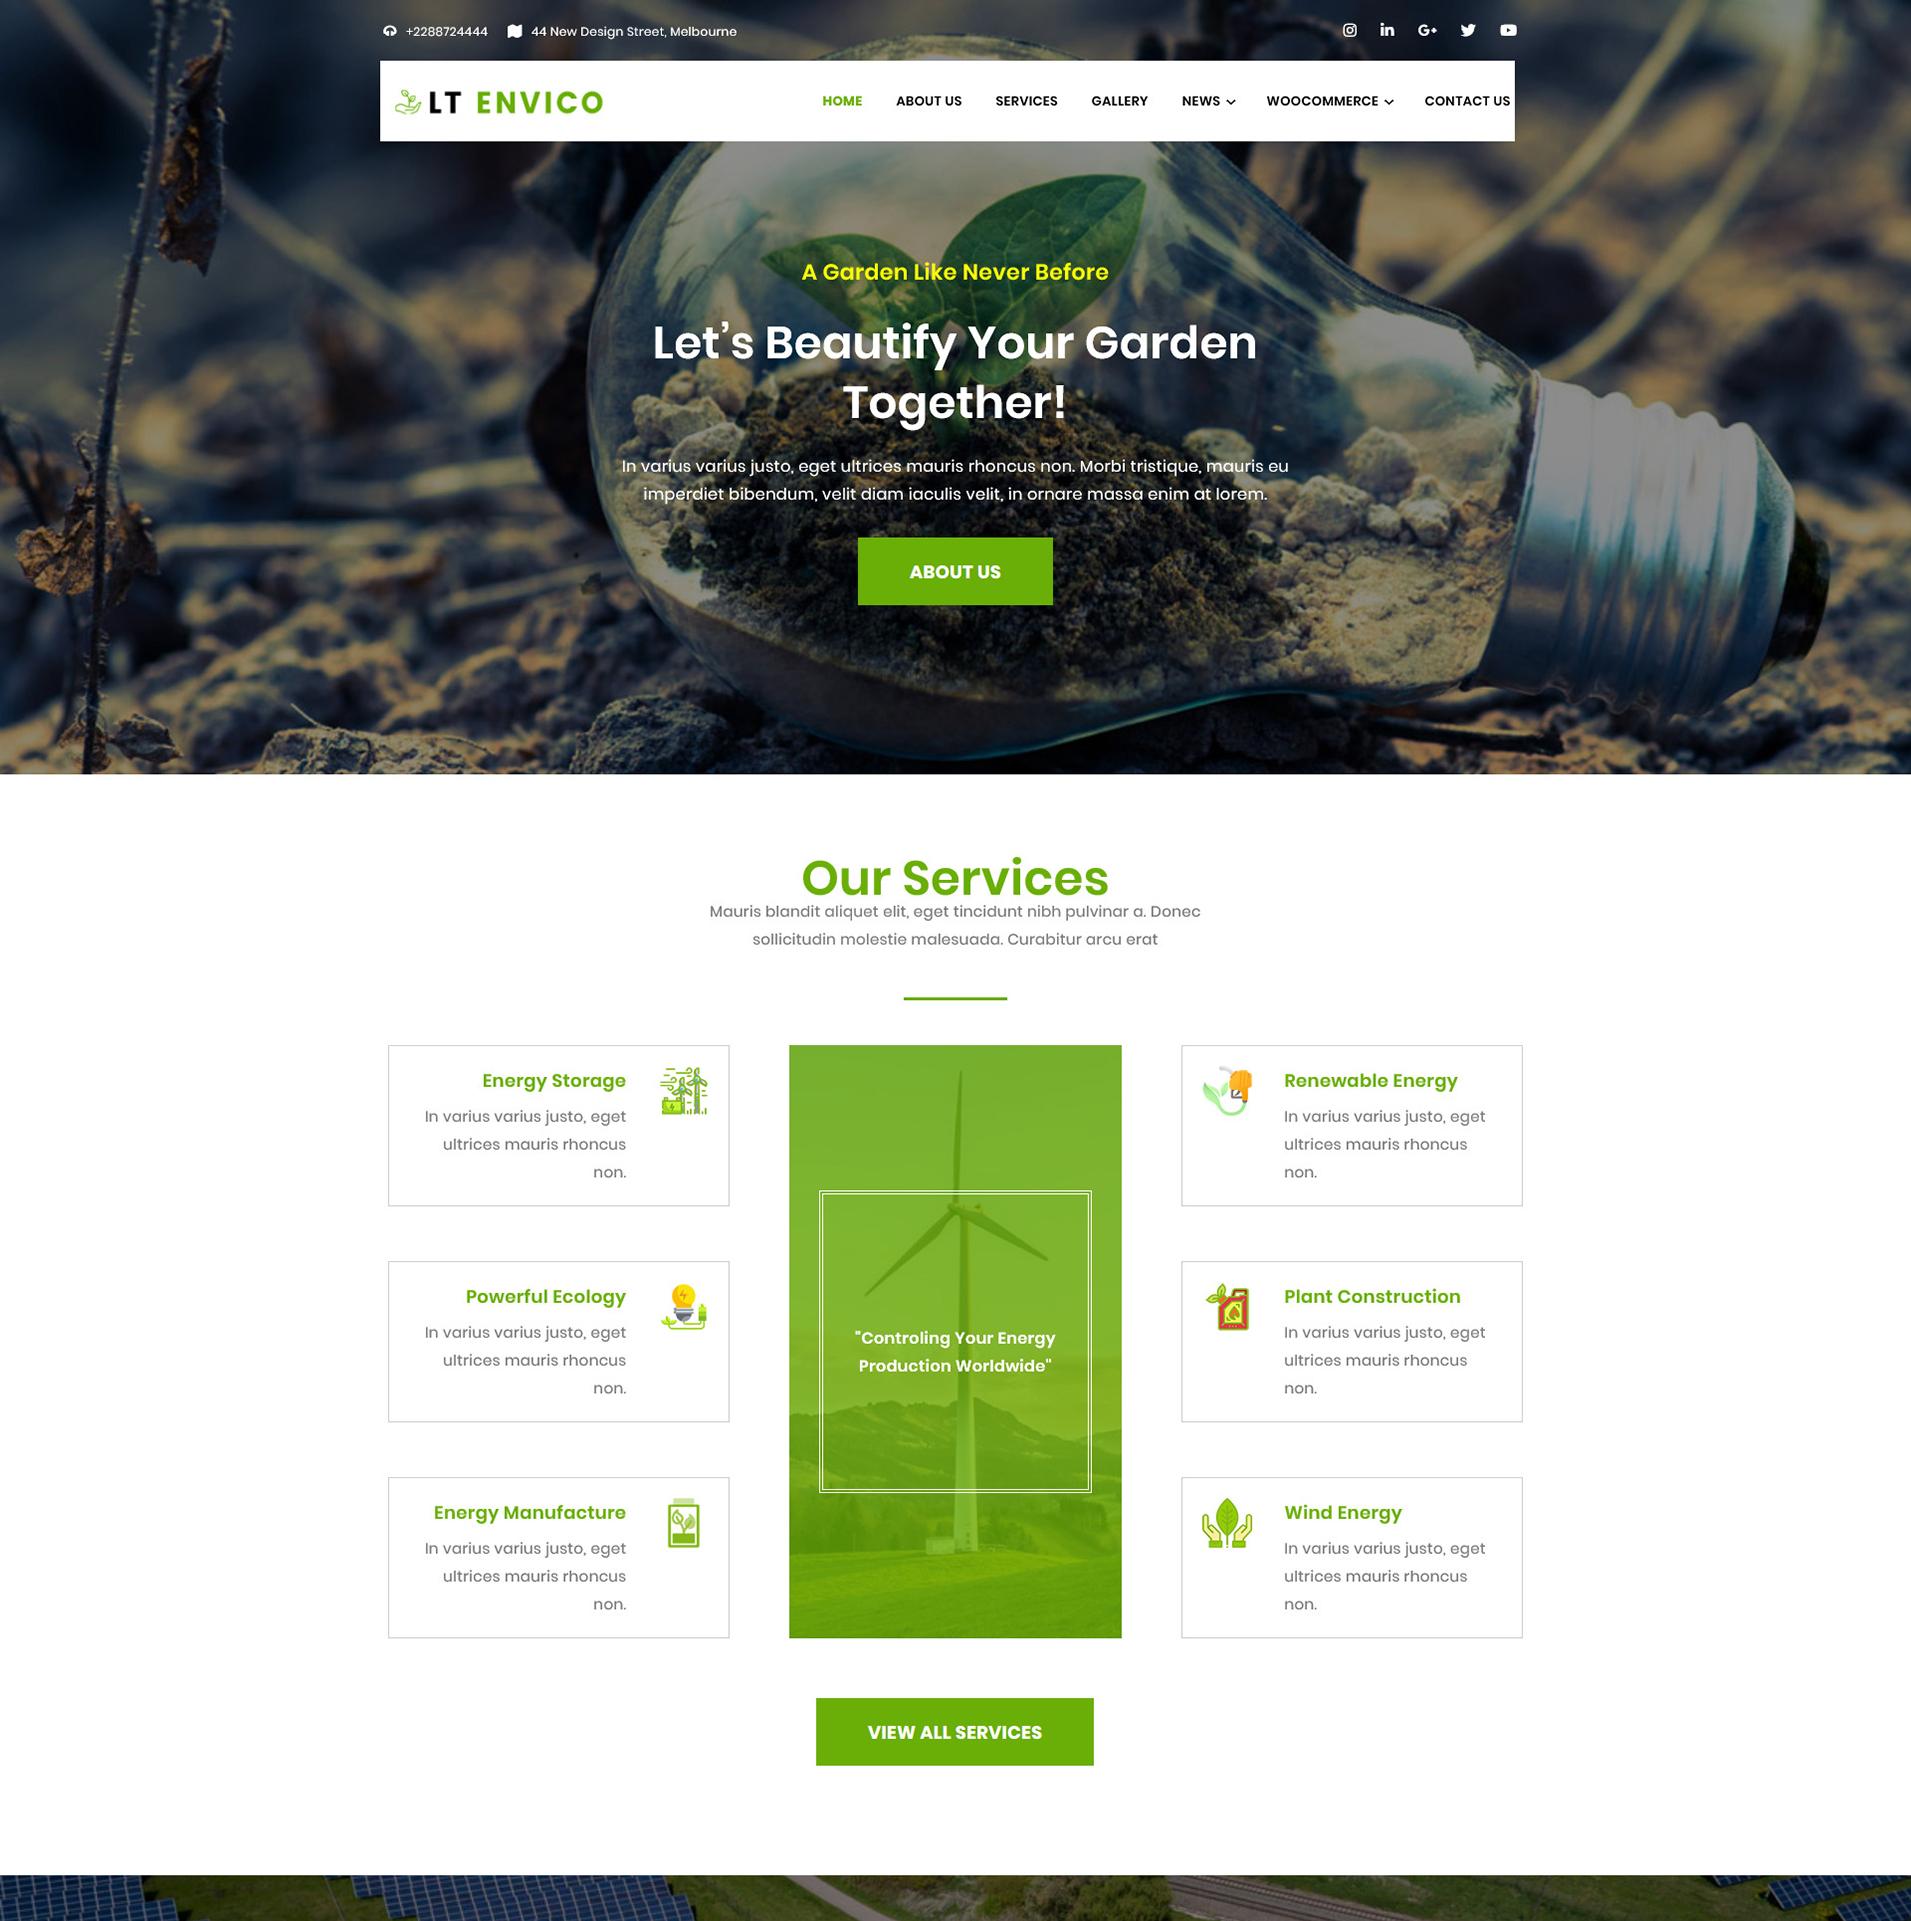 lt-envico-wordpress-theme-full